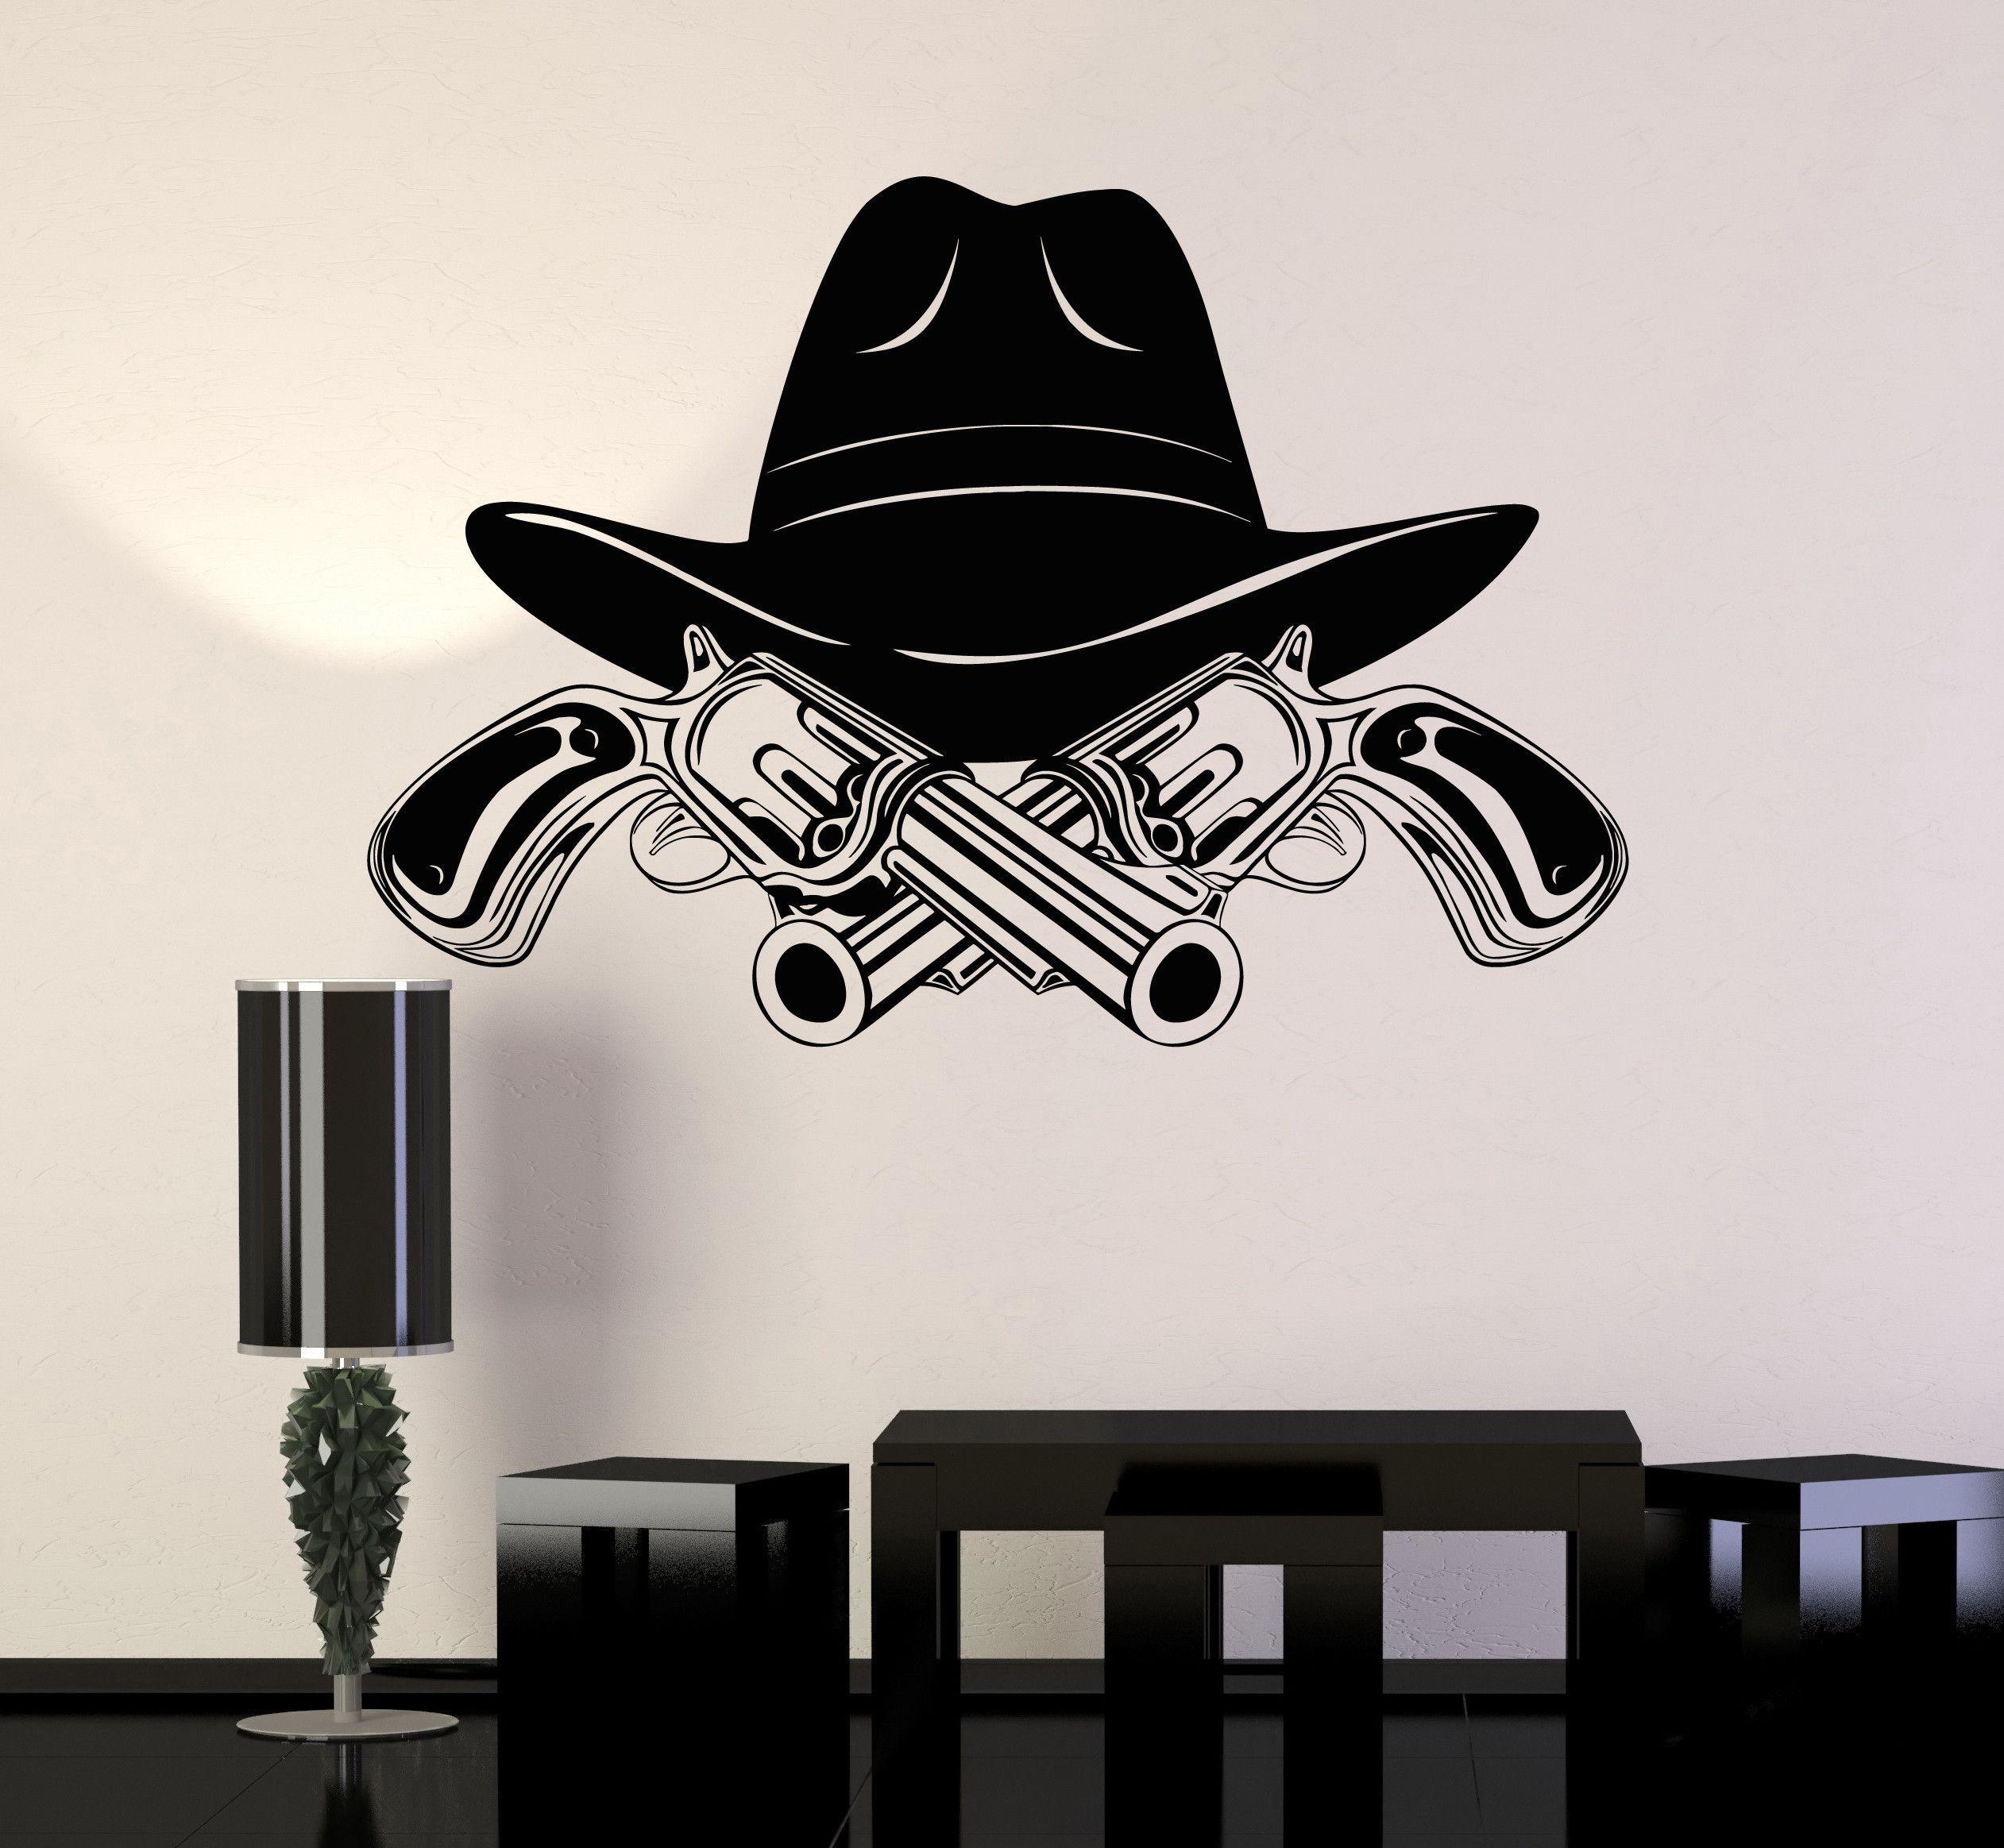 Vinyl Wall Decal Cowboy Hat Revolvers Wild West Boy Room Stickers ...